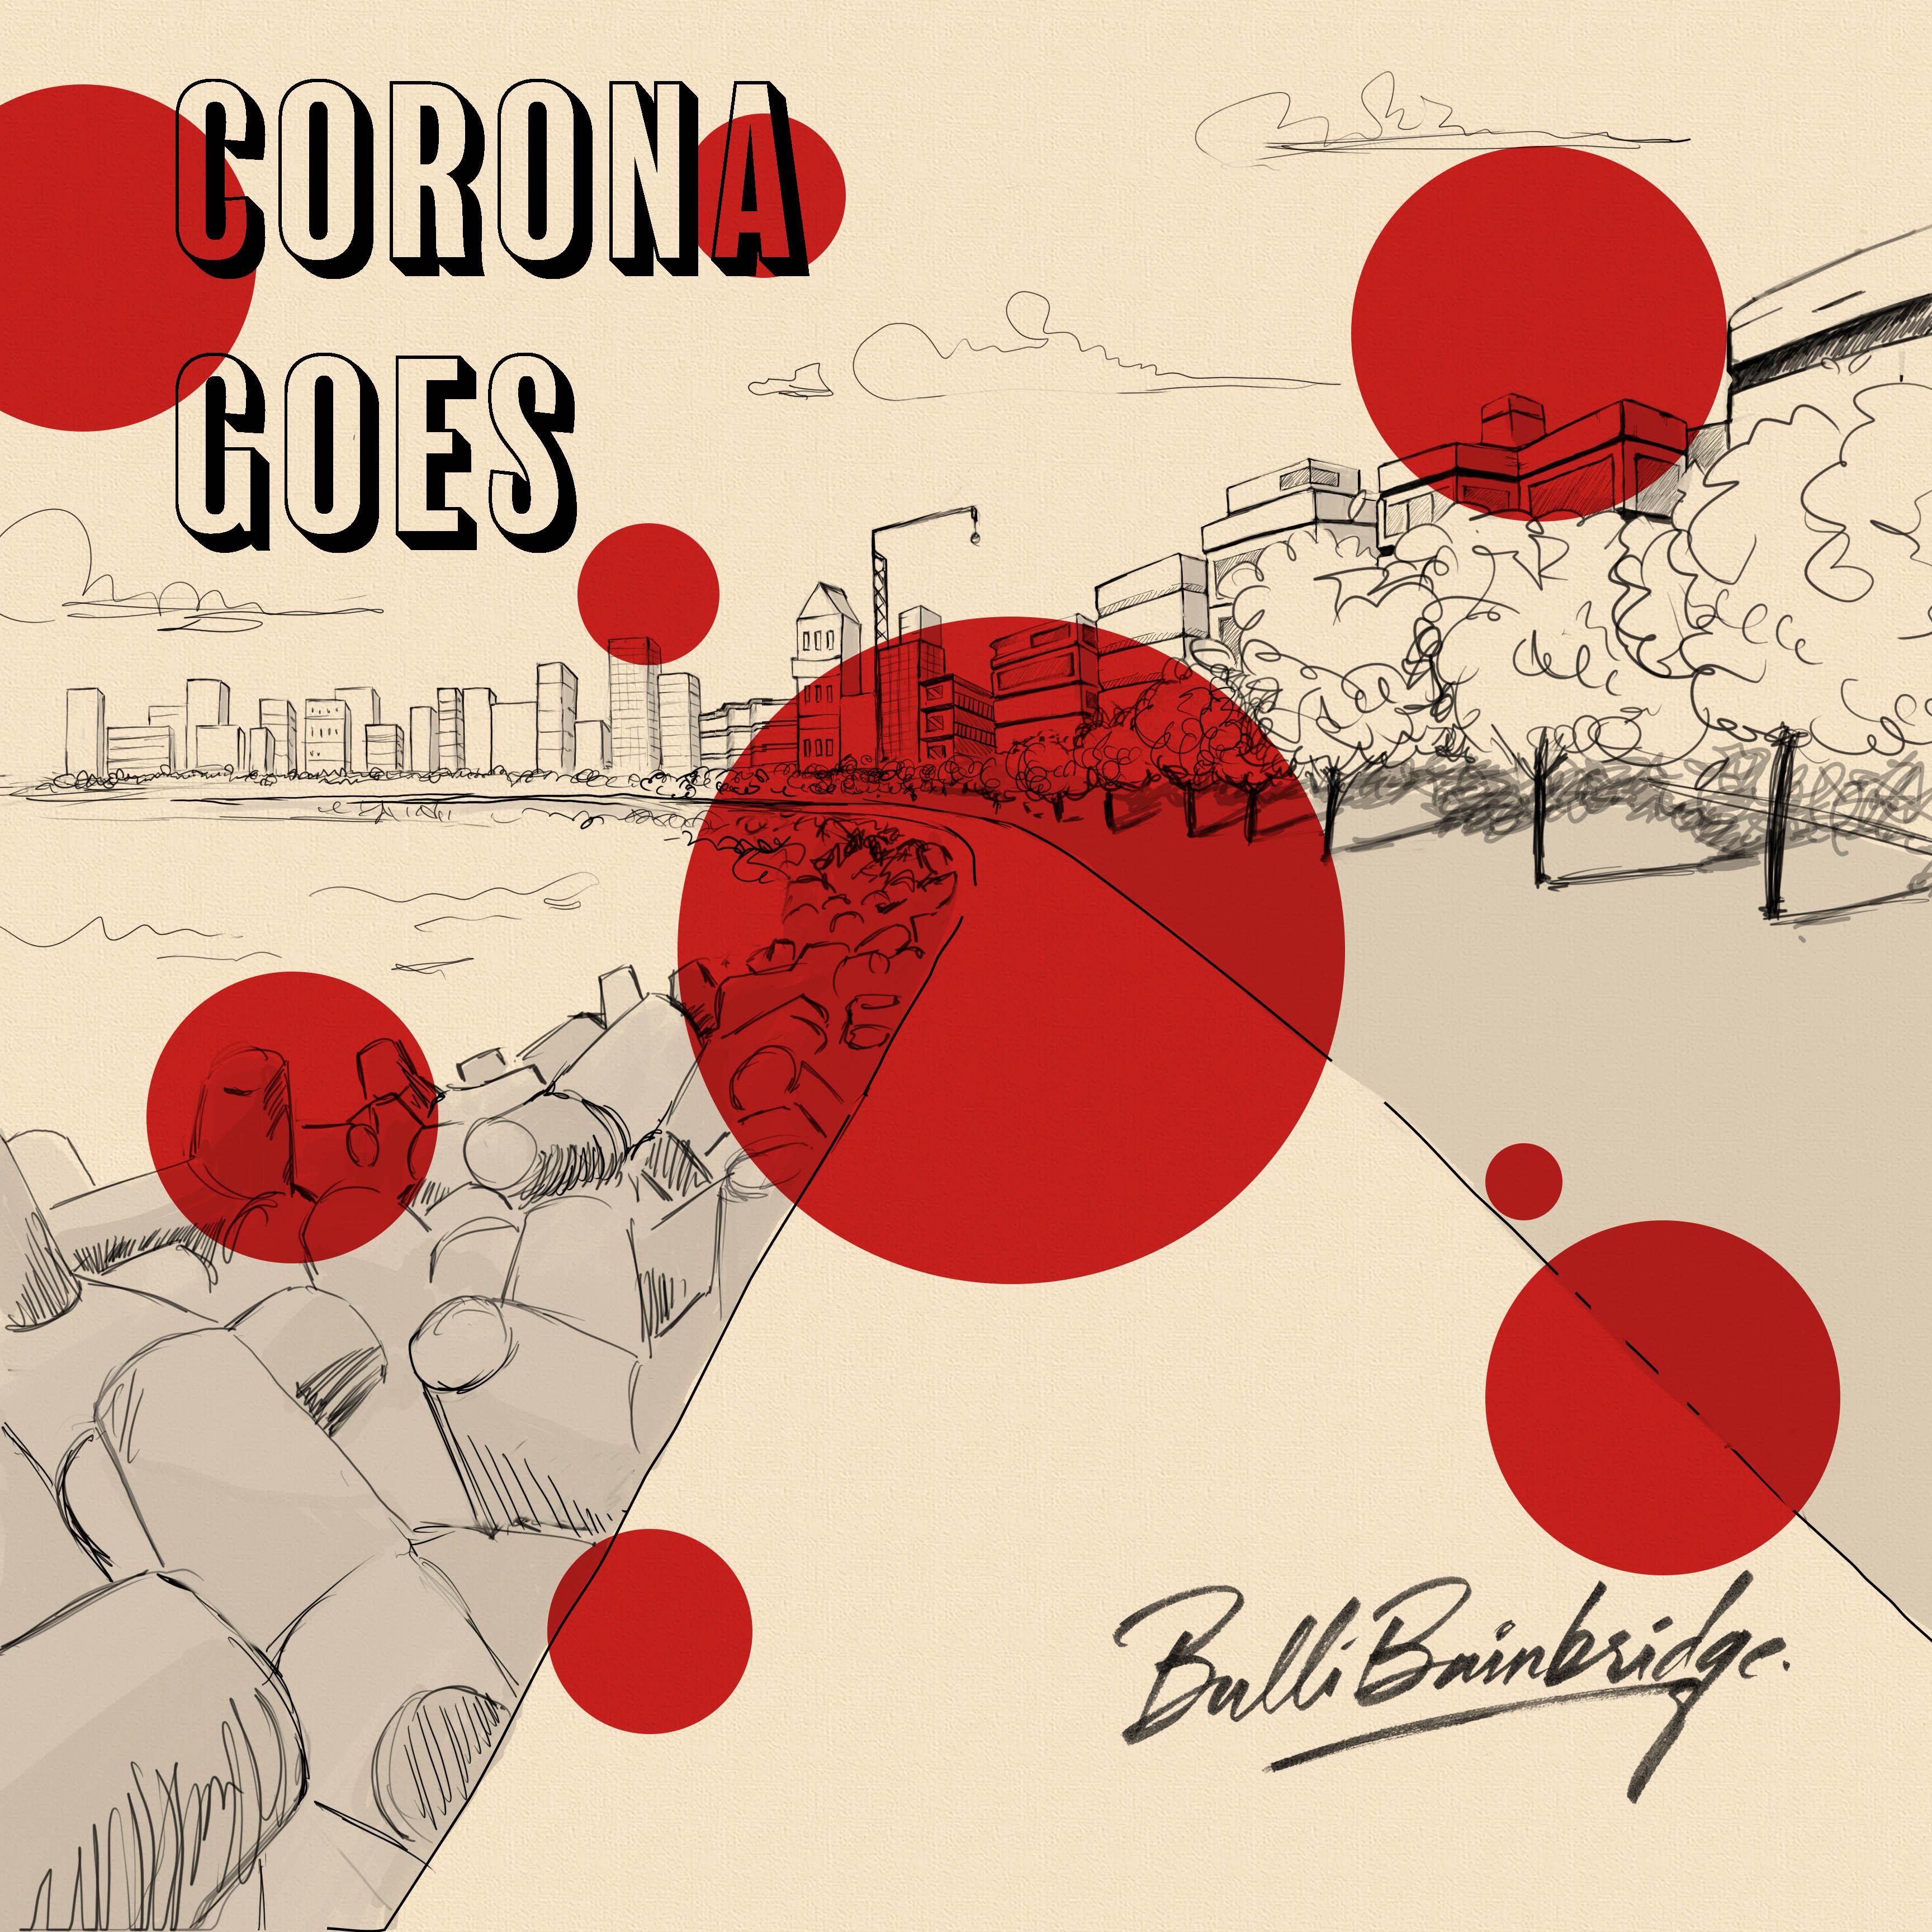 CoronaGoes Bulli Bainbridge